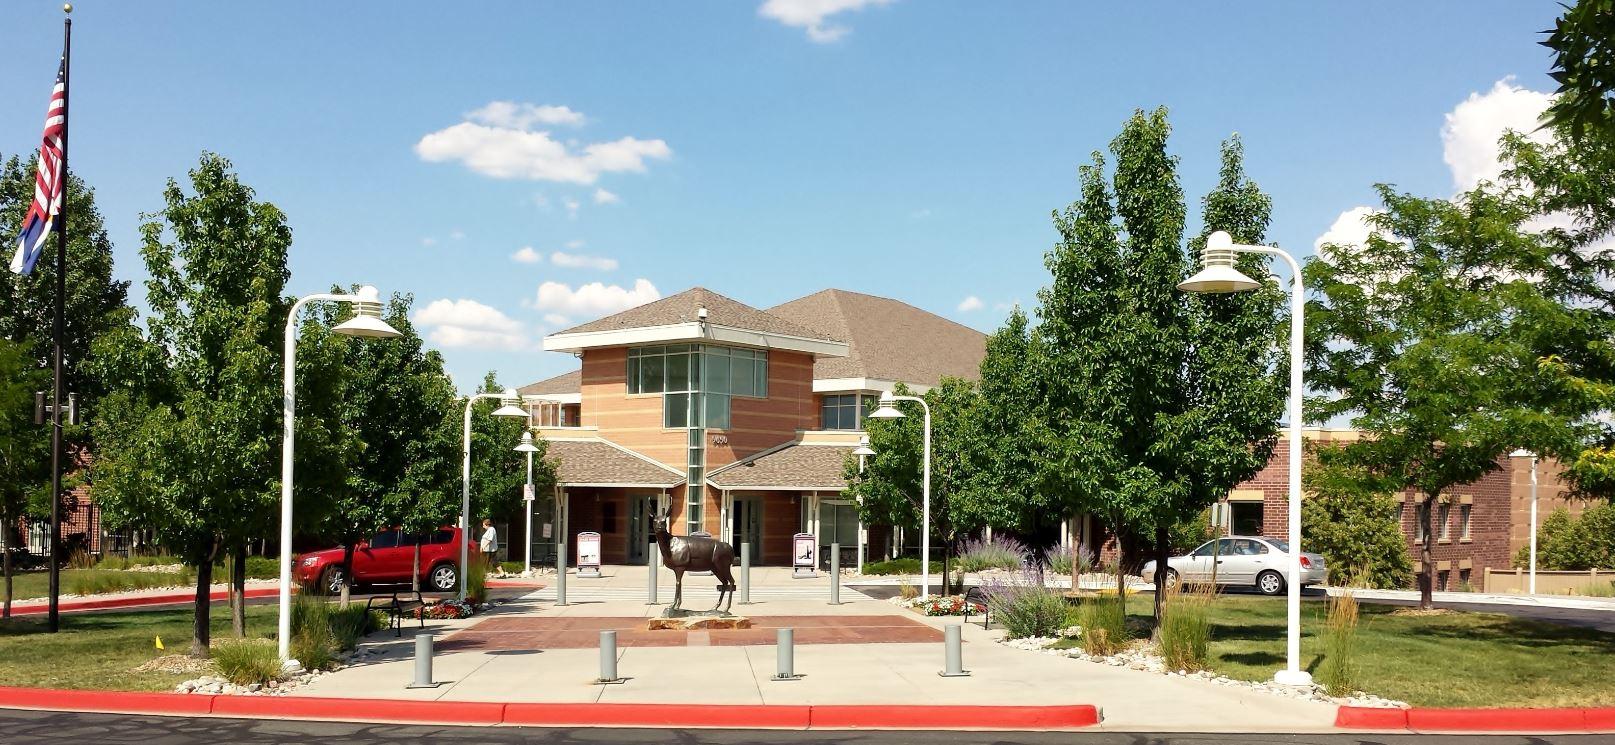 Westridge Rec Center - Highlands Ranch, CO